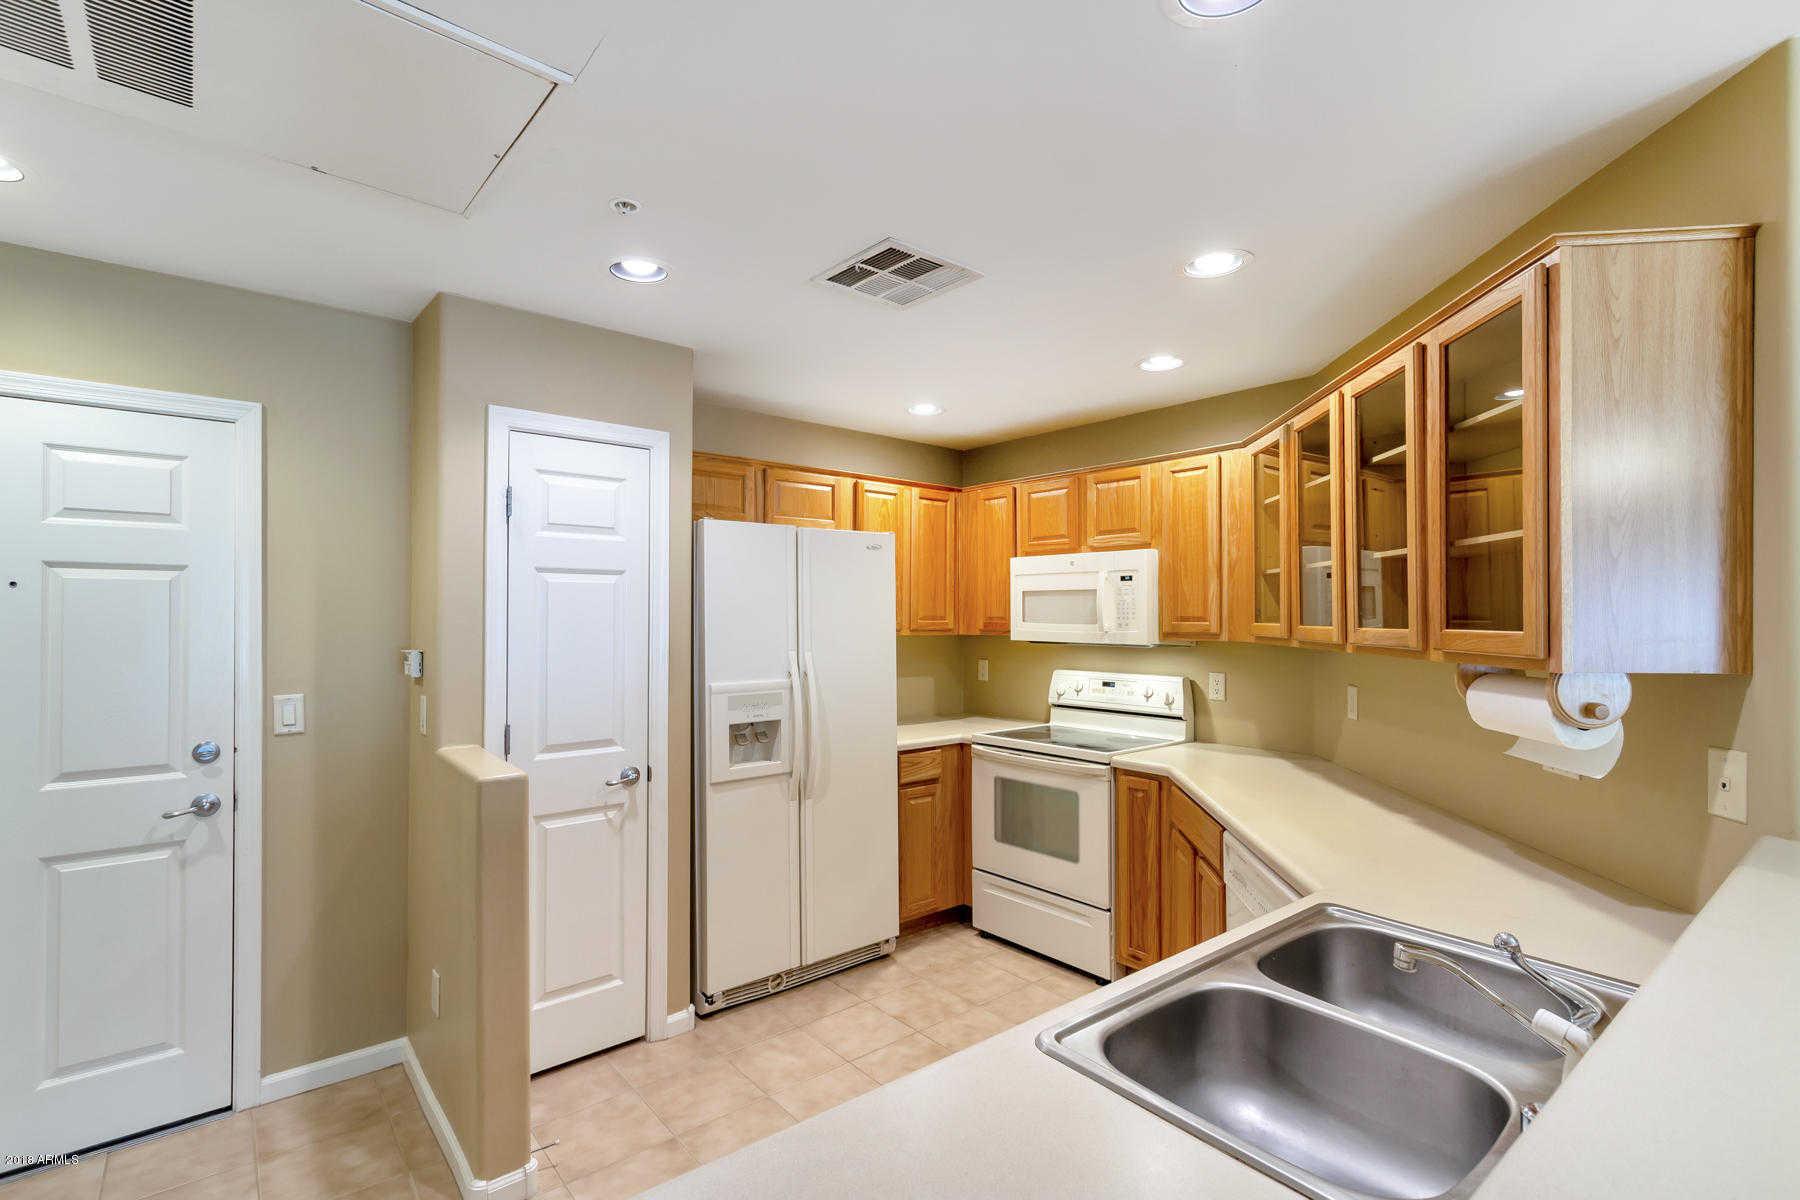 $260,000 - 2Br/2Ba -  for Sale in Bella Vista, Scottsdale